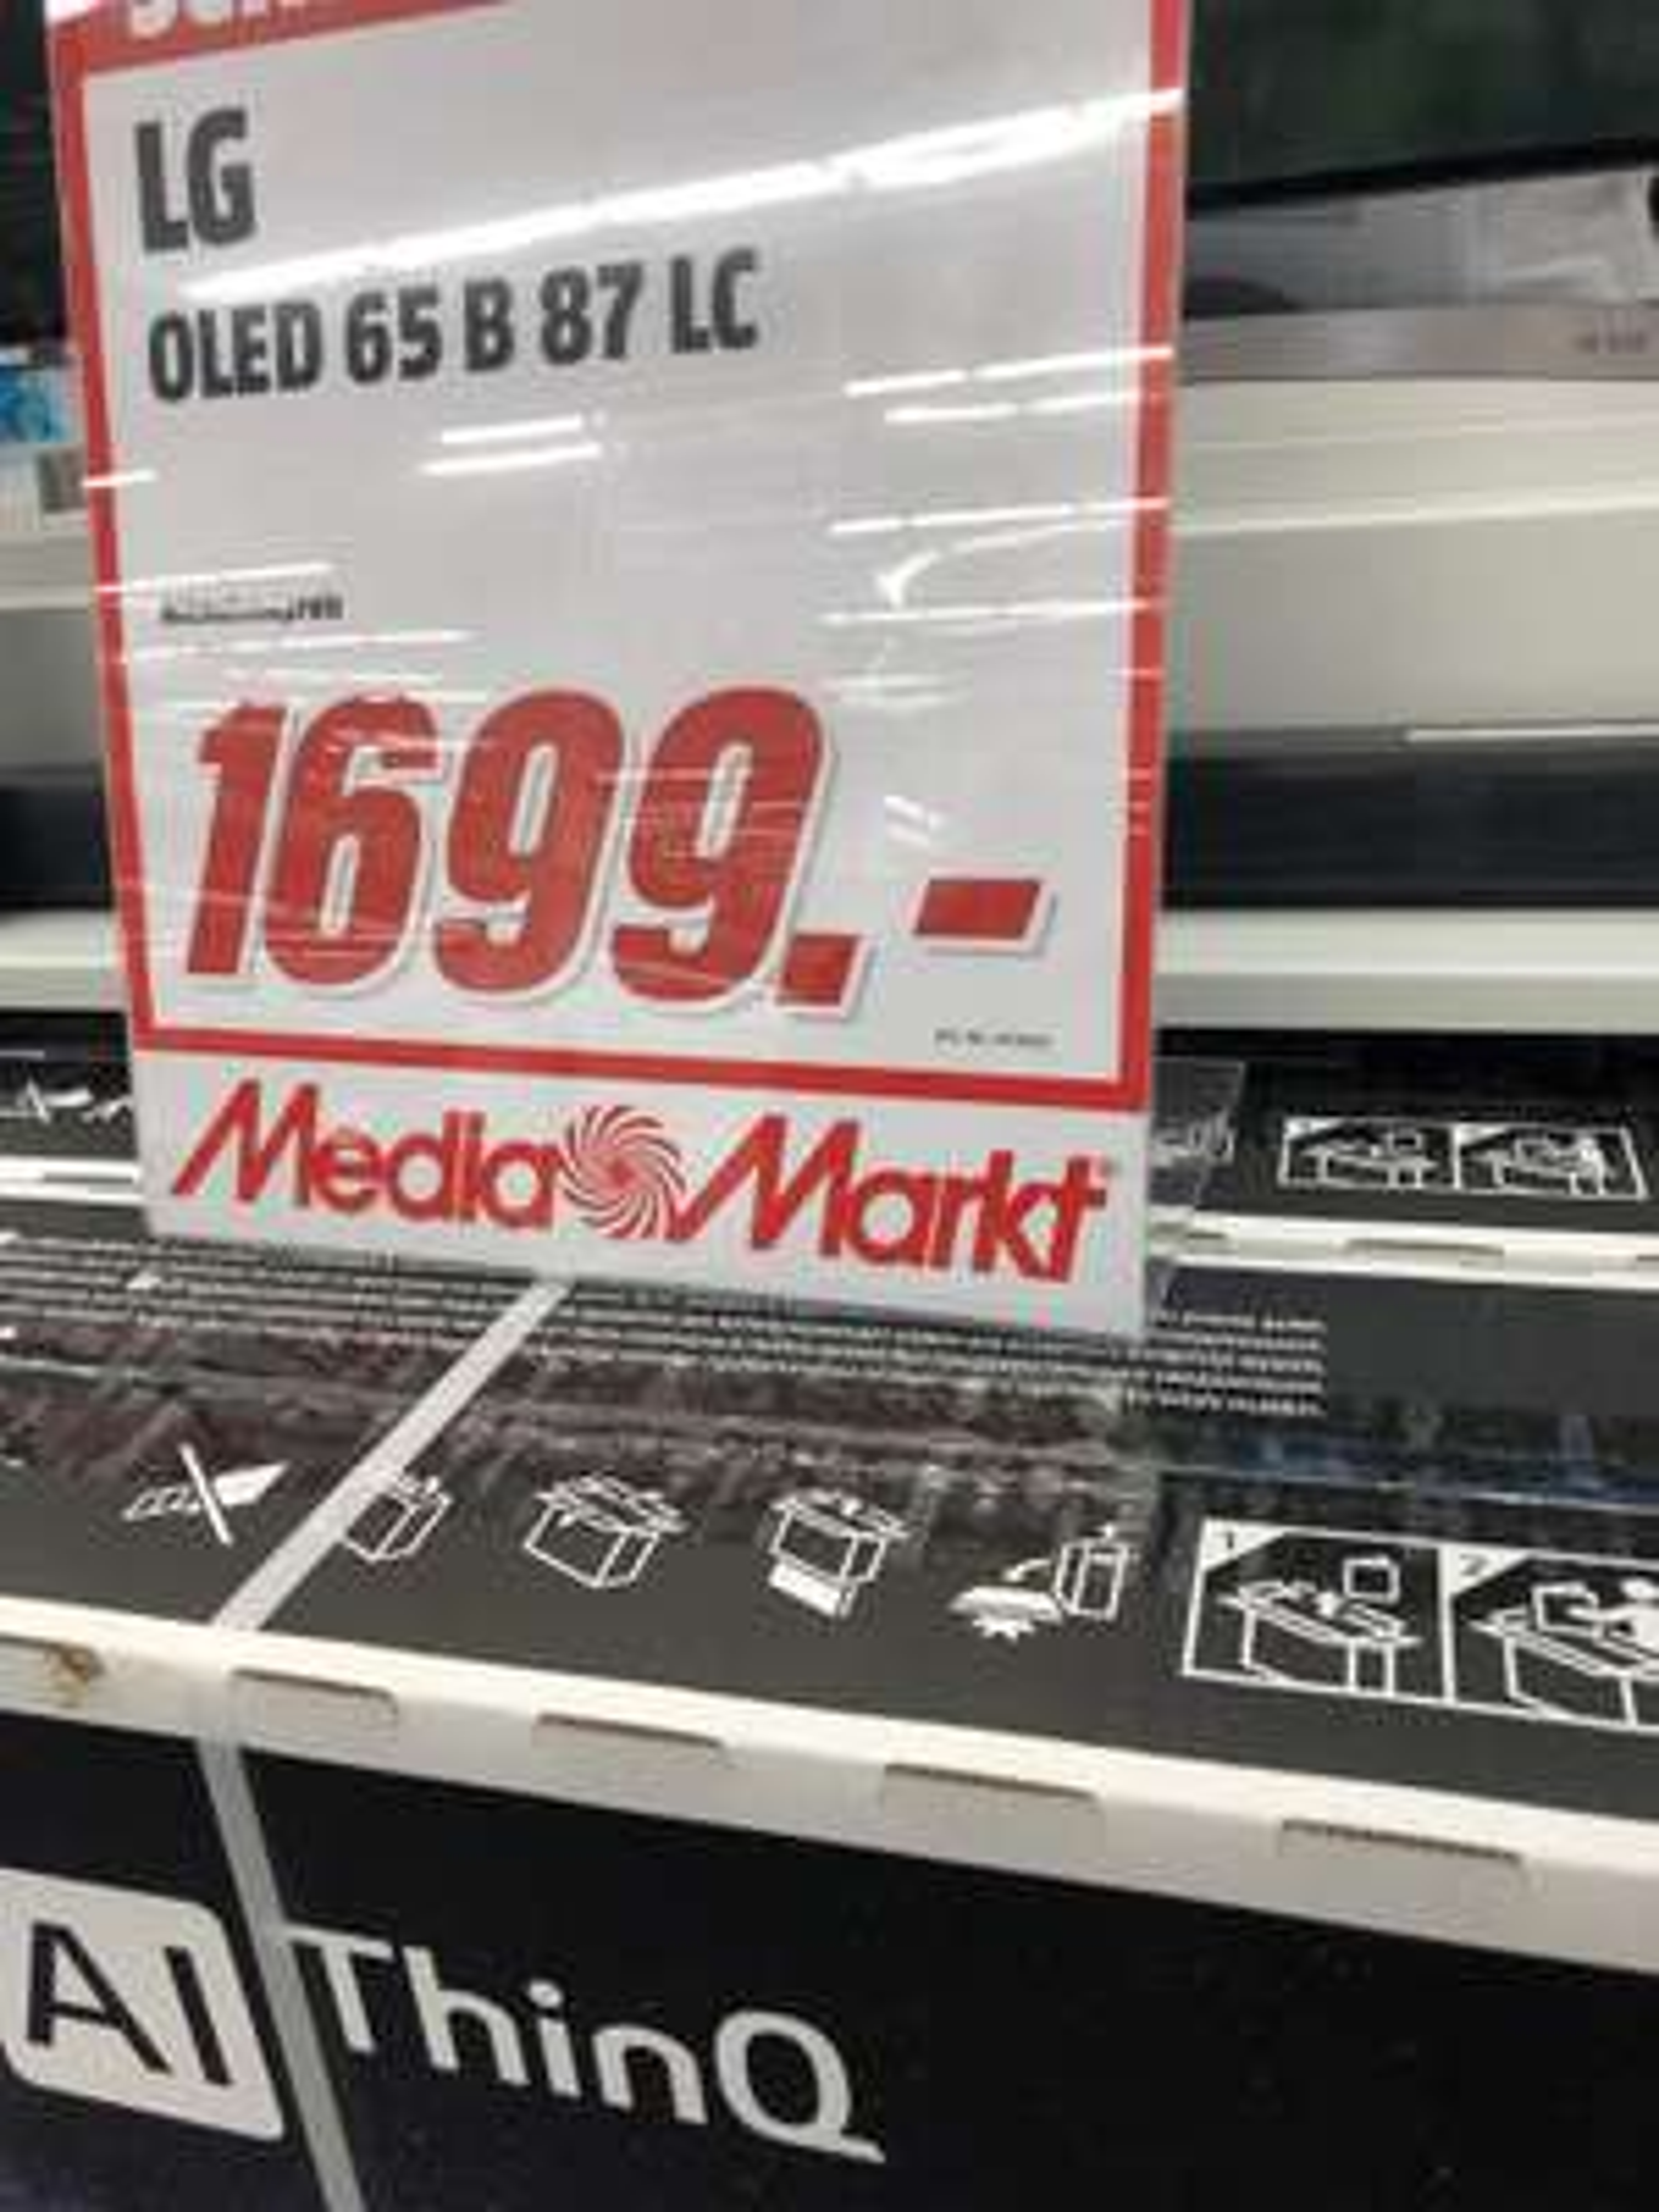 [Lokal Heilbronn] LG OLED 65 B87 LC